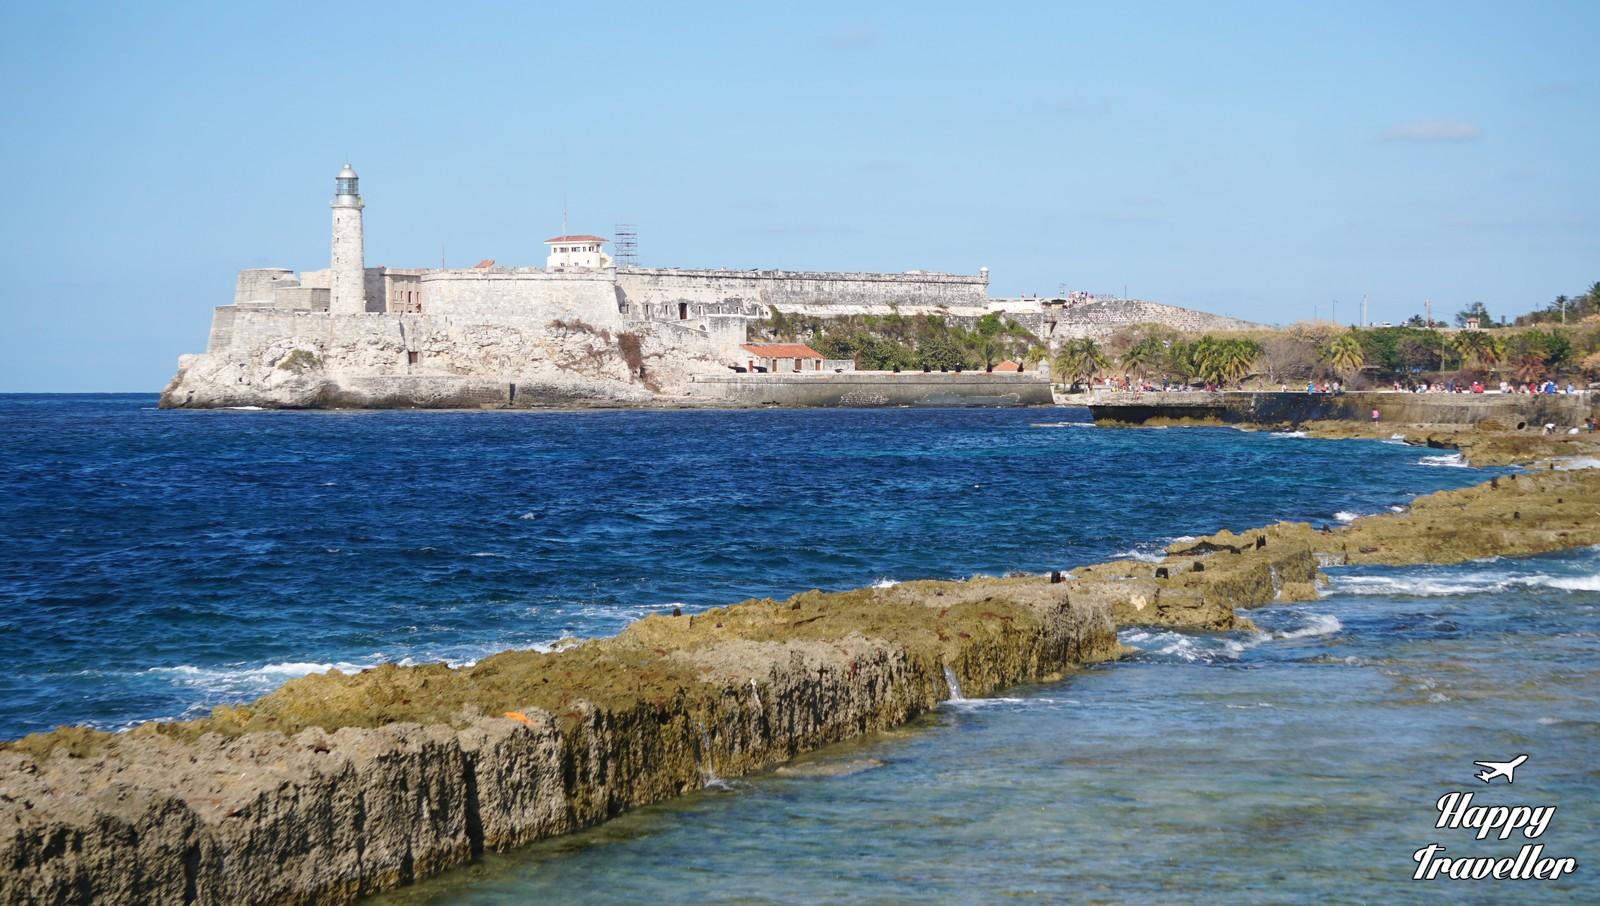 719e1f298a71 Τα 10 πράγματα που πρέπει να κάνεις όταν πας στην Κούβα